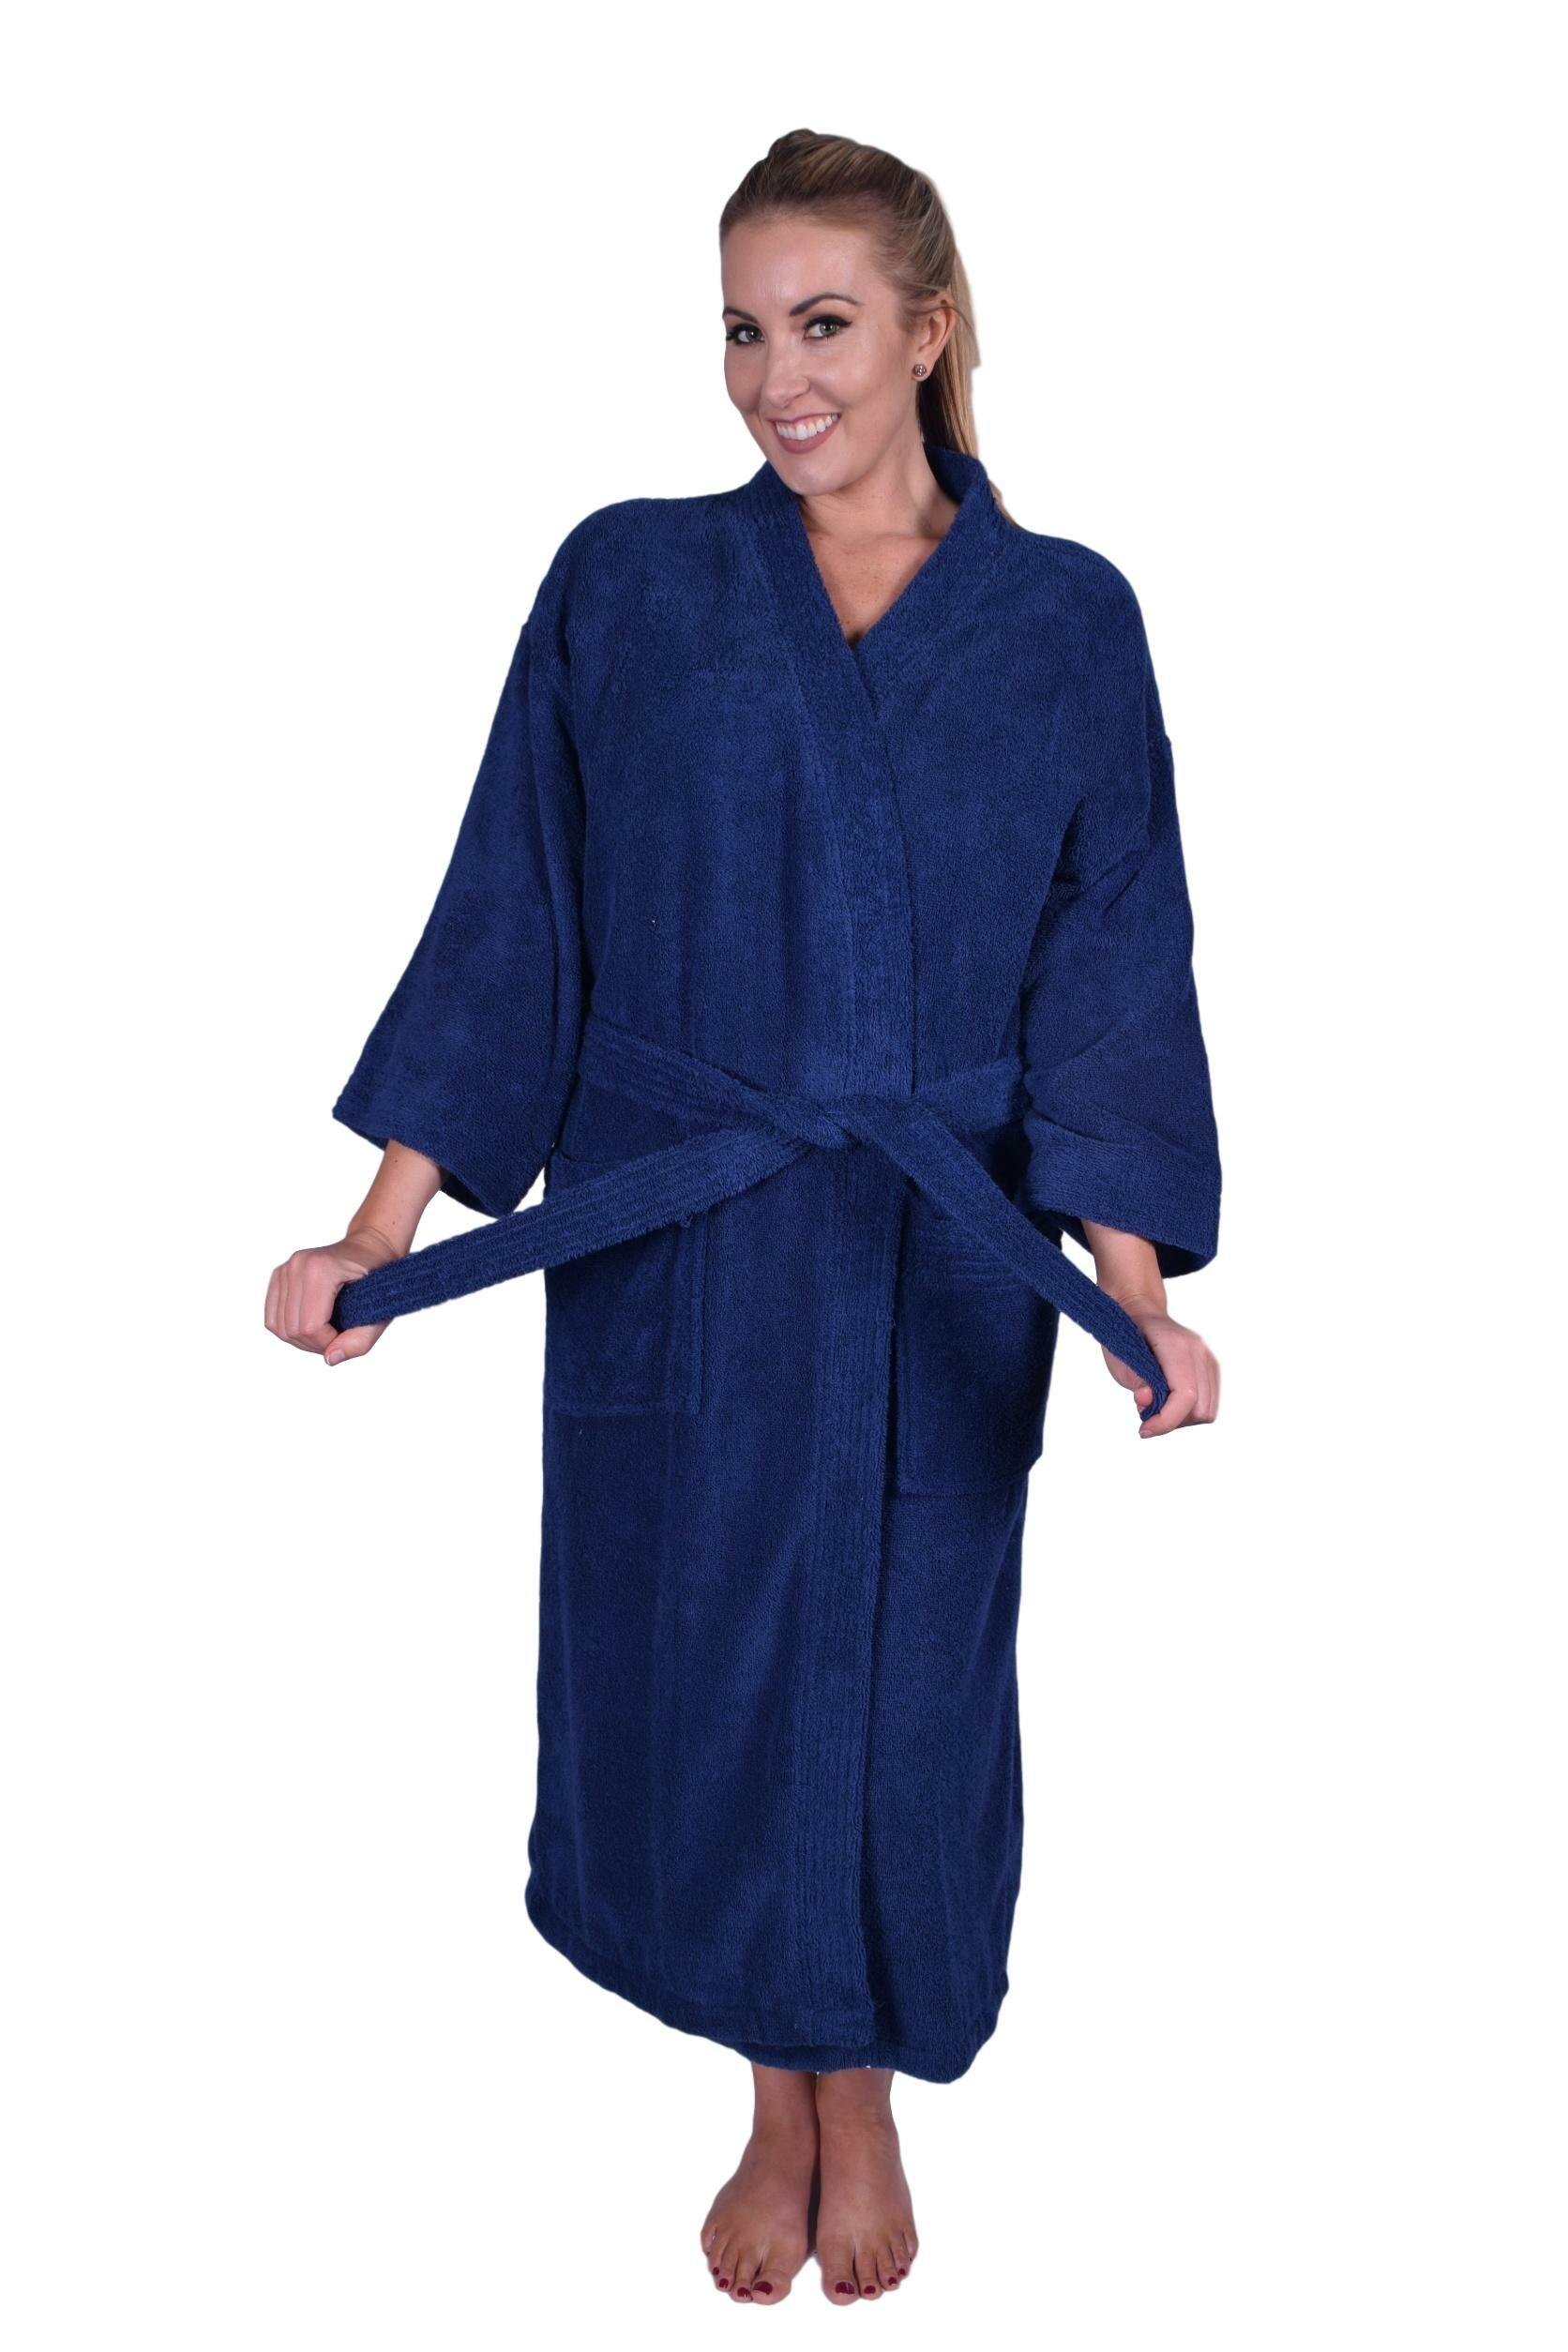 PUFFY COTTON Solid Natural Soft Kimono 100% Cotton Bathrobe  b7ad2a4b8